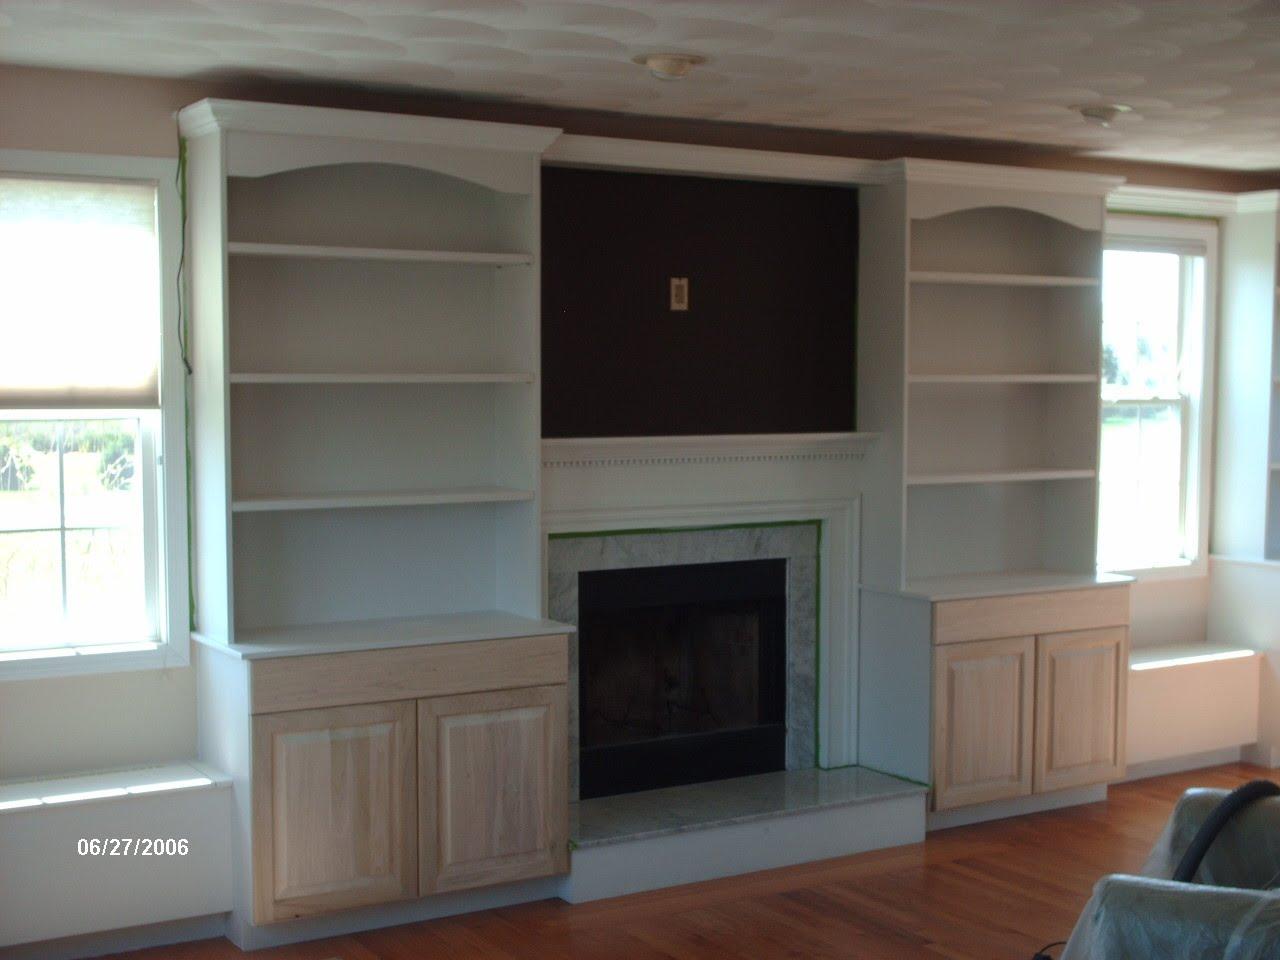 Roggero Custom Cabinetry & Interiors: Custom Bookcases And ...